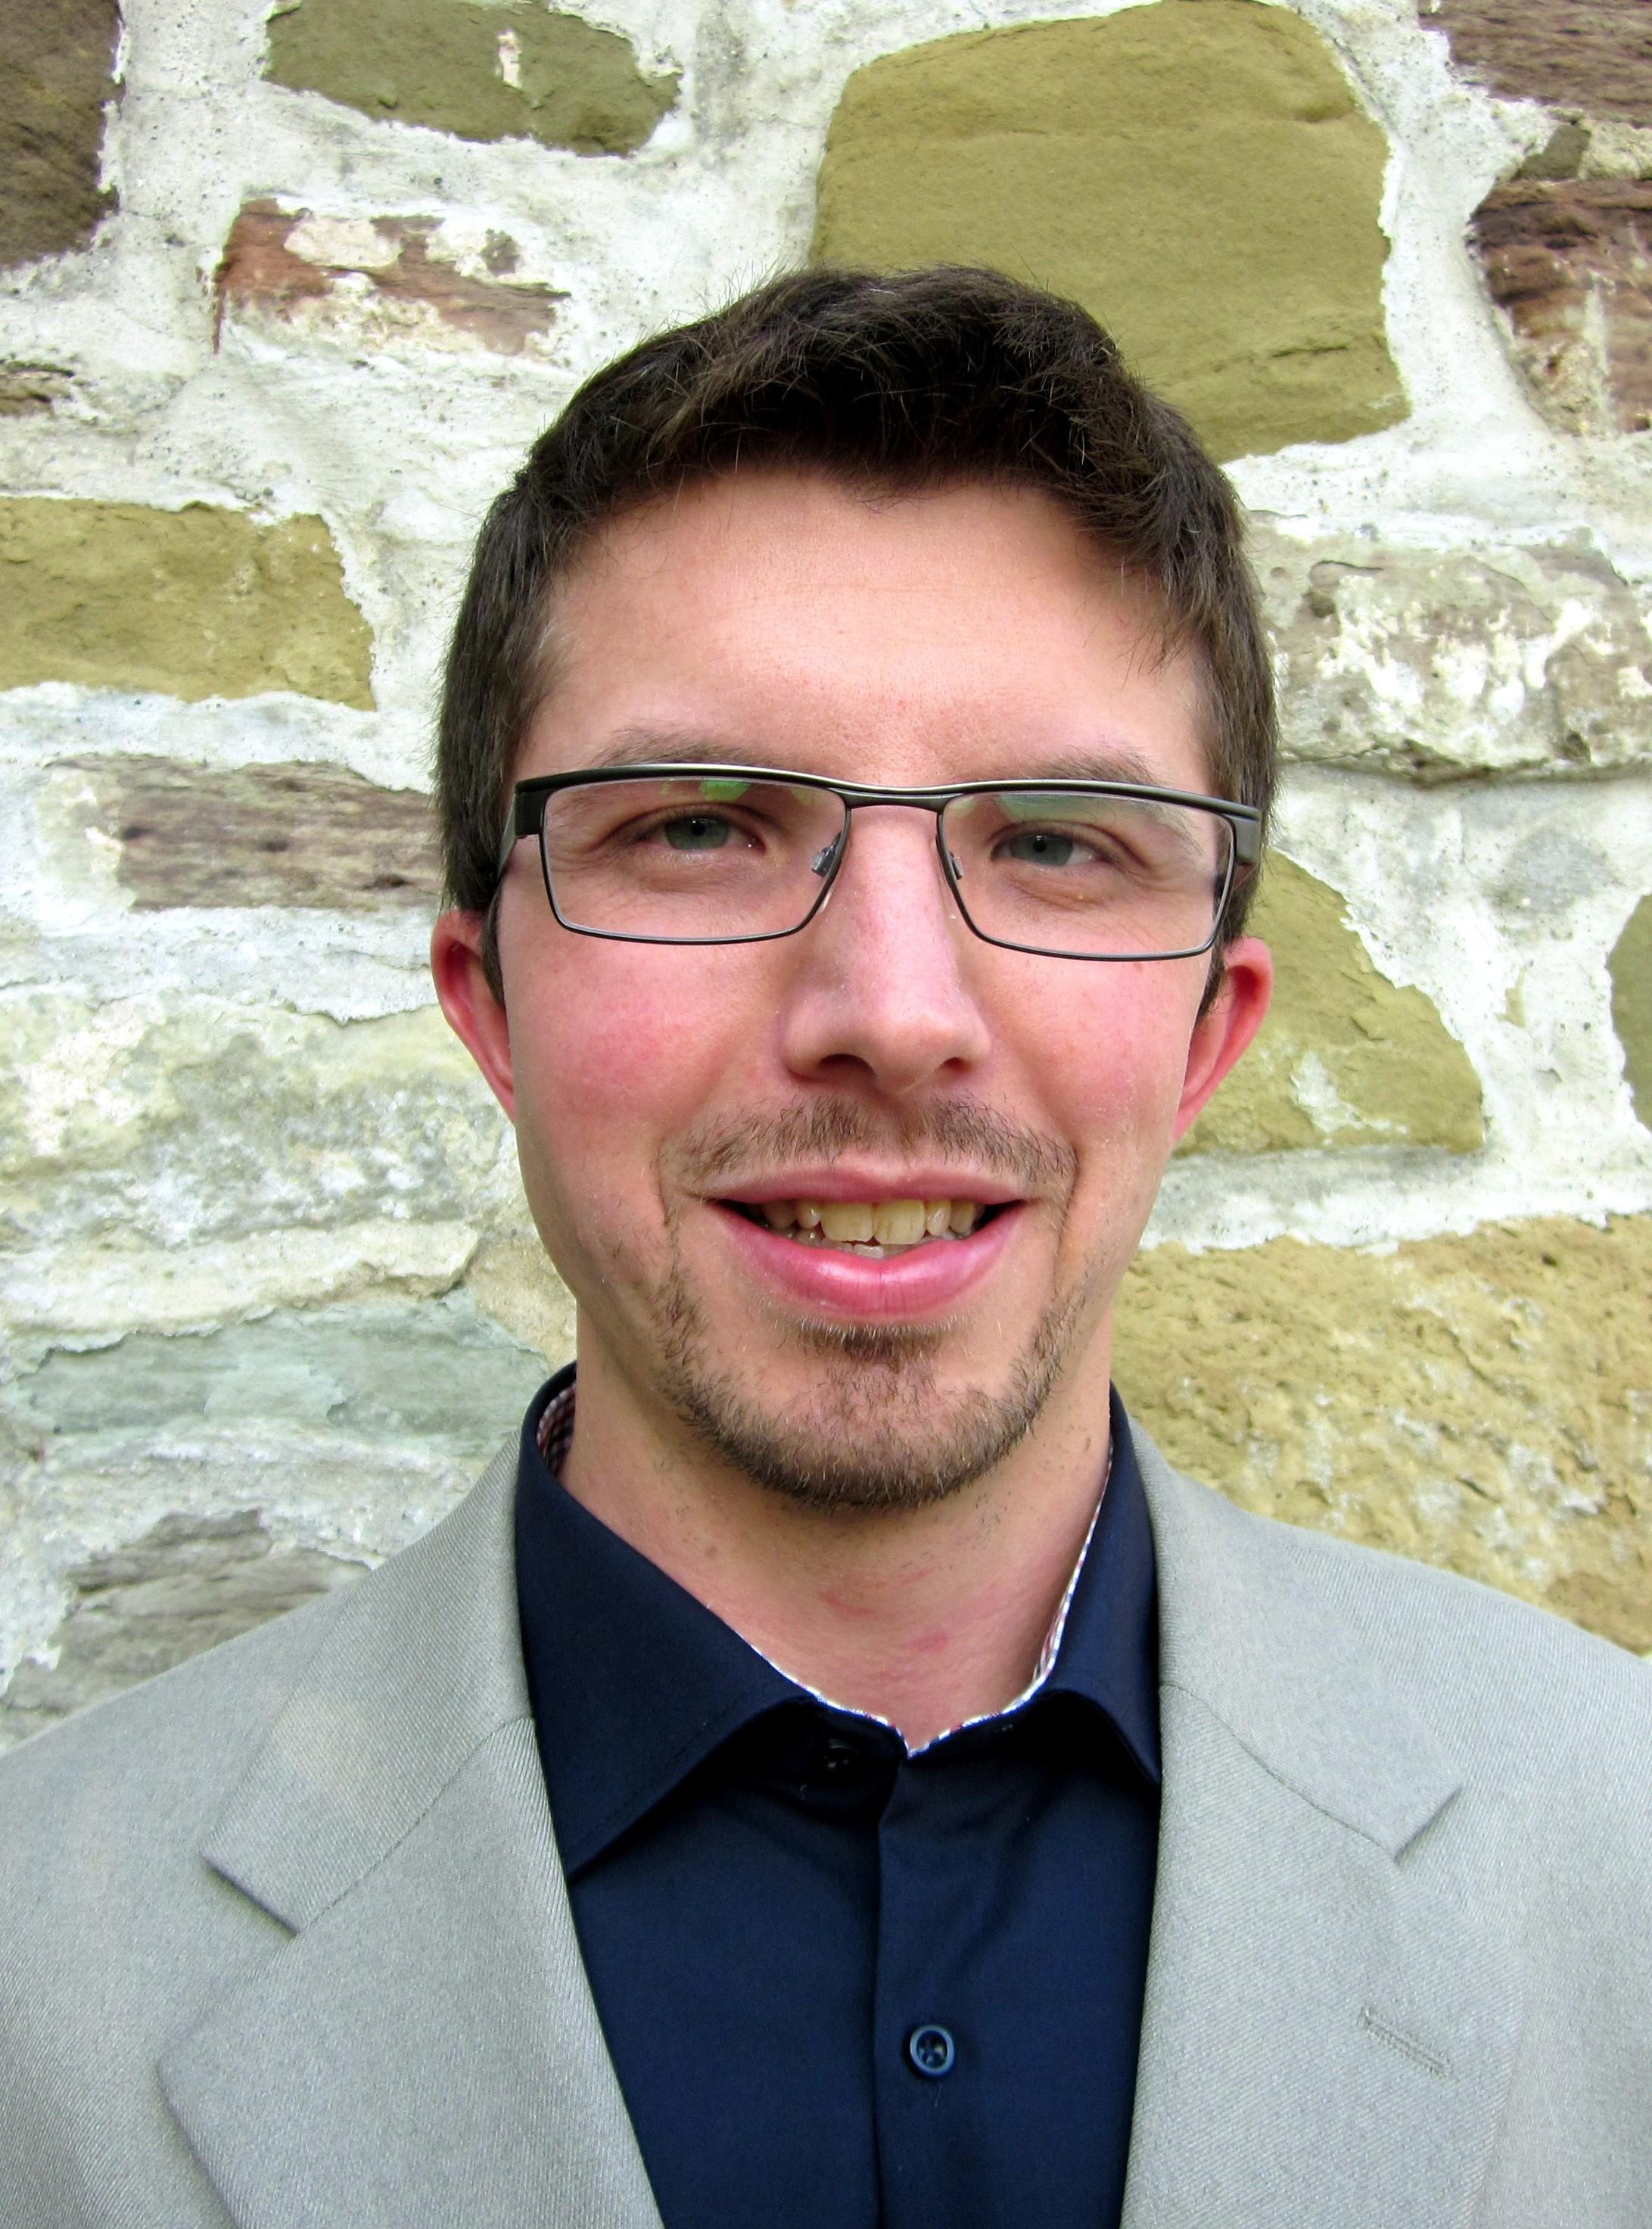 Marcel Stürz